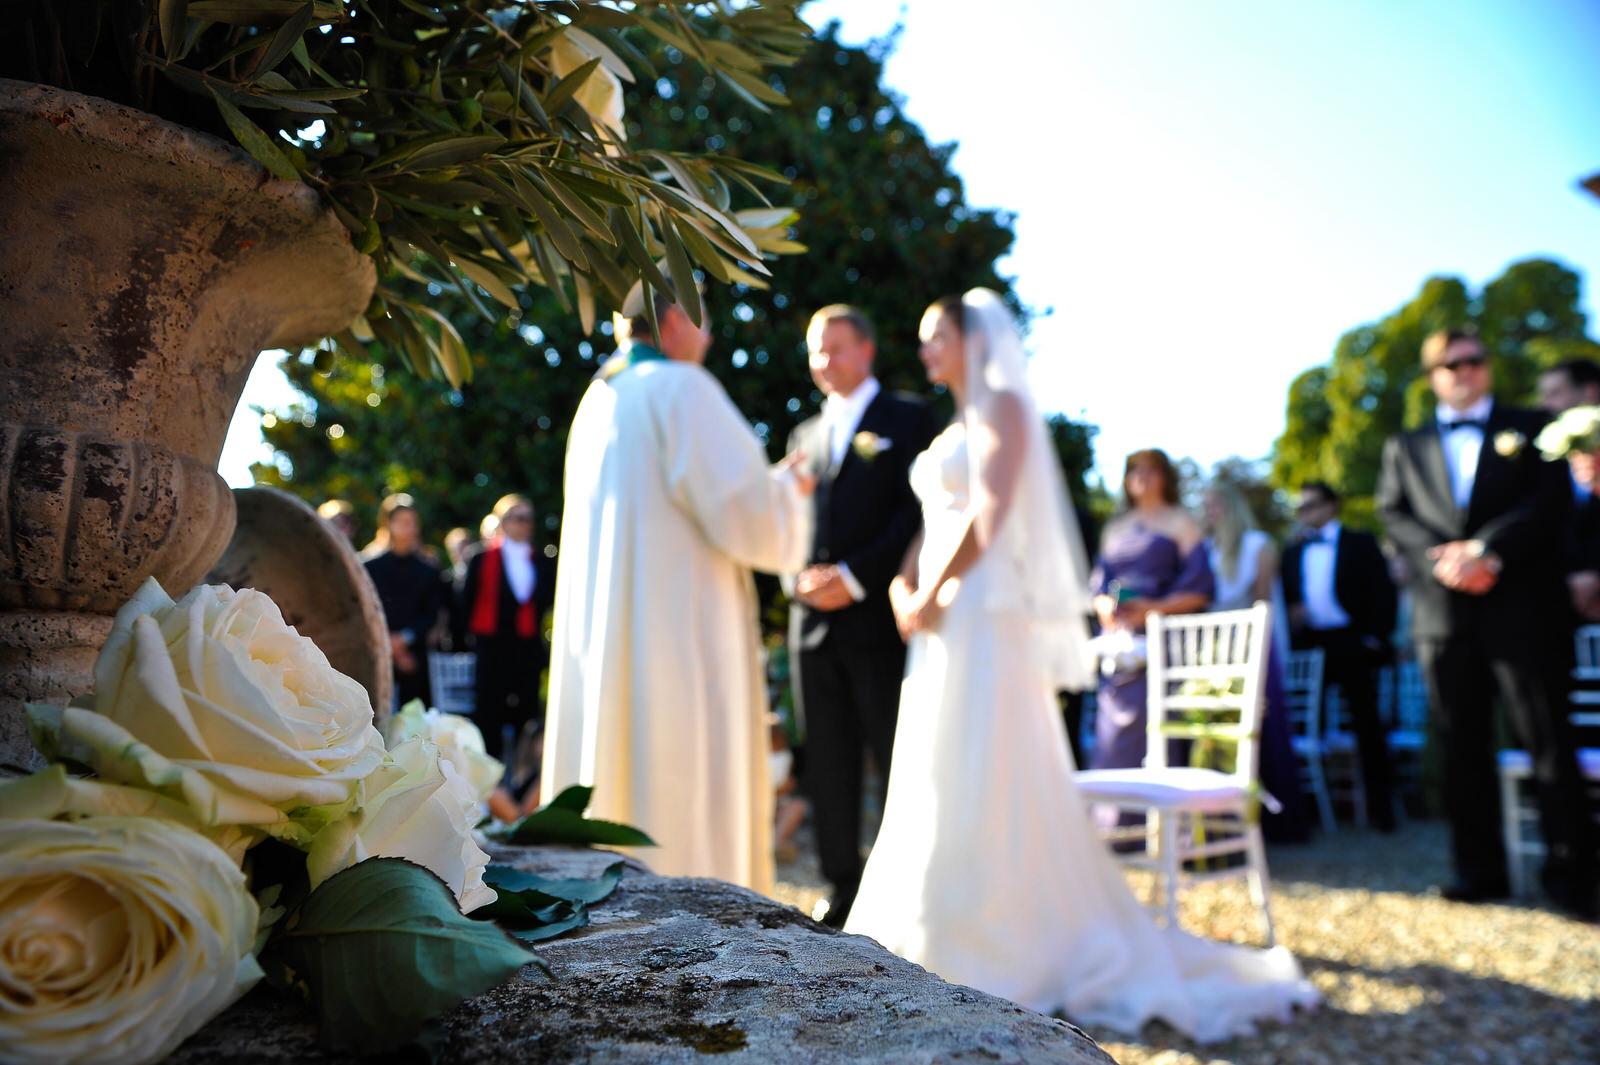 tuscany-wedding-planners-ceremonies-02.jpg